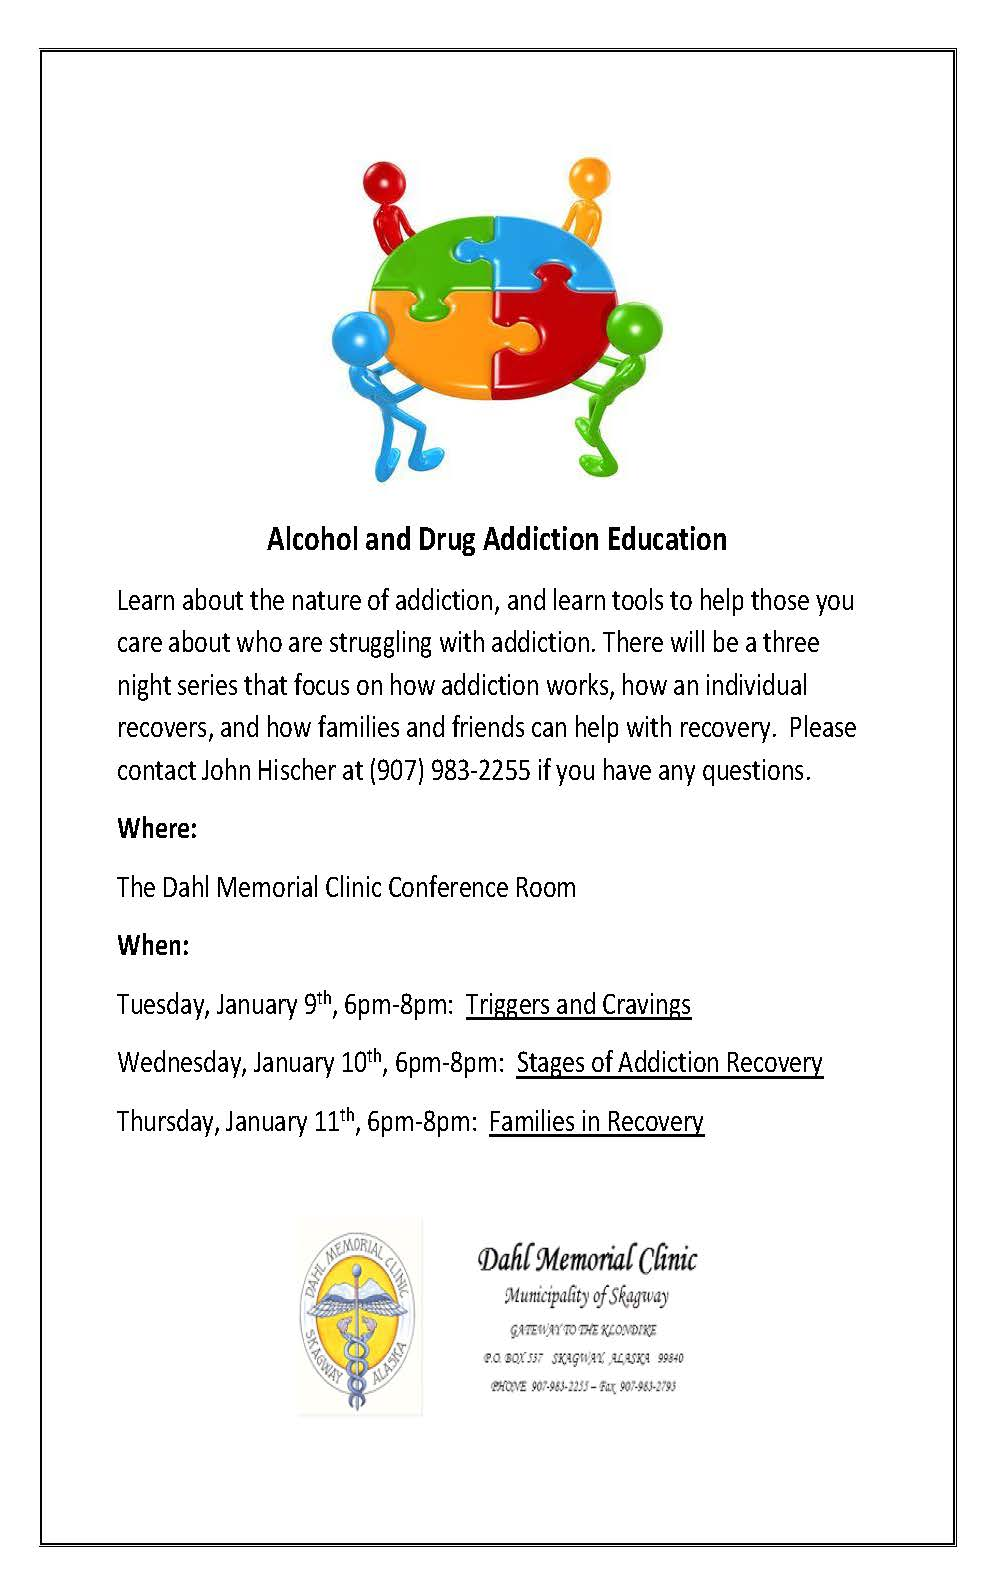 Alcohol and Drug Addiction Education.jpg